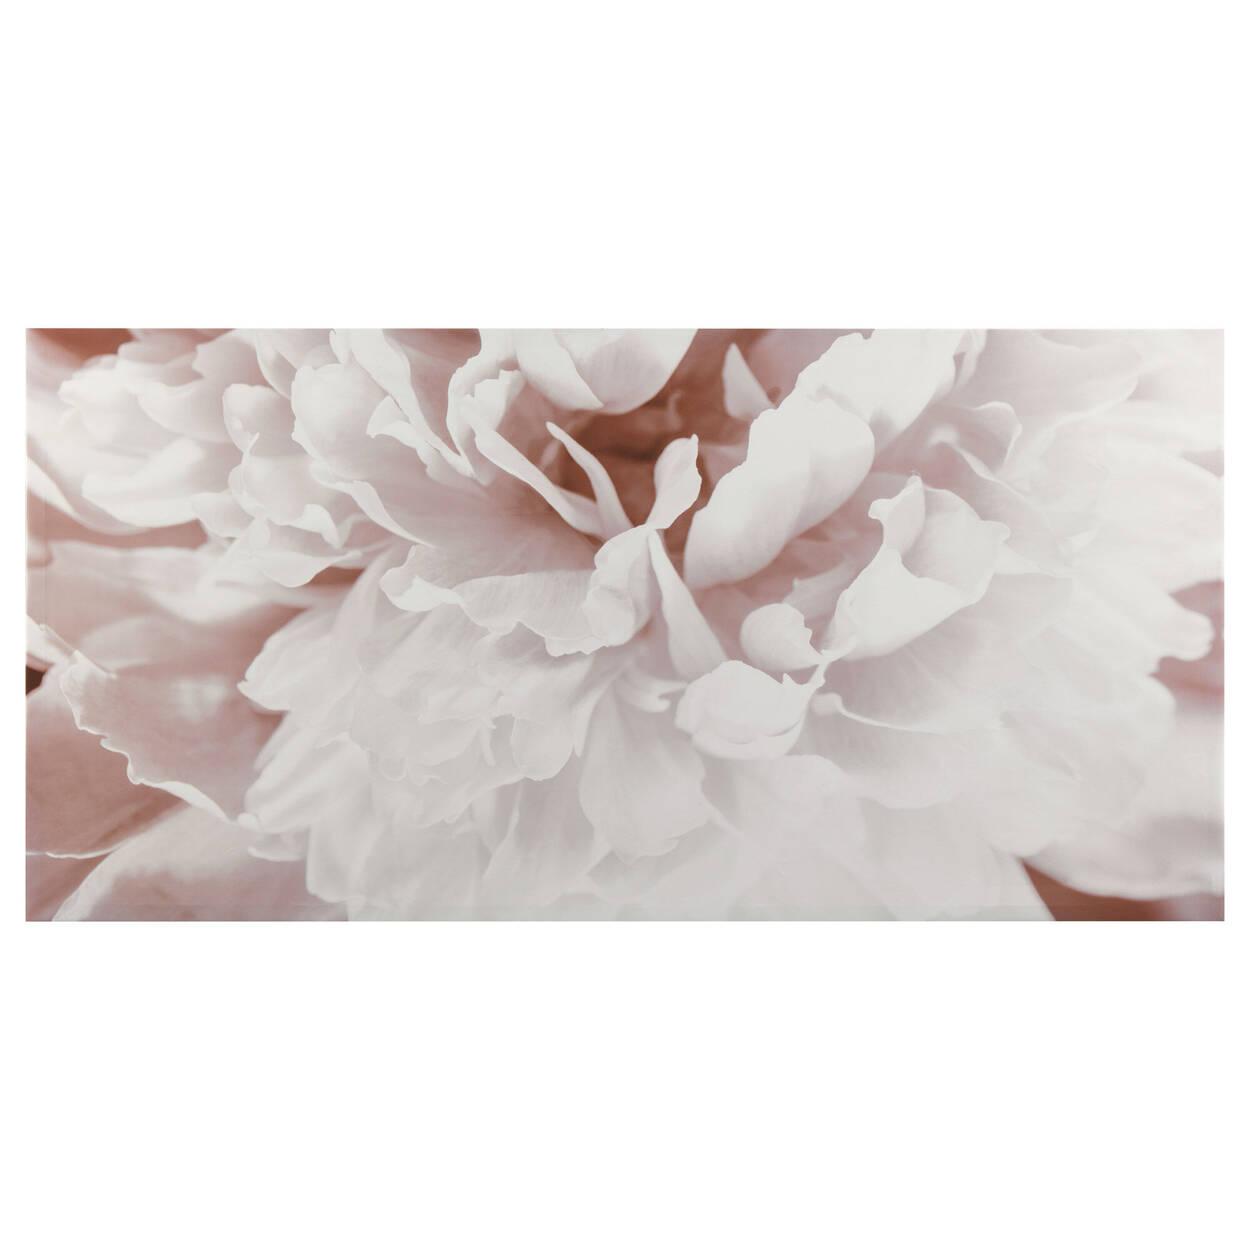 Tableau imprimé fleur rose